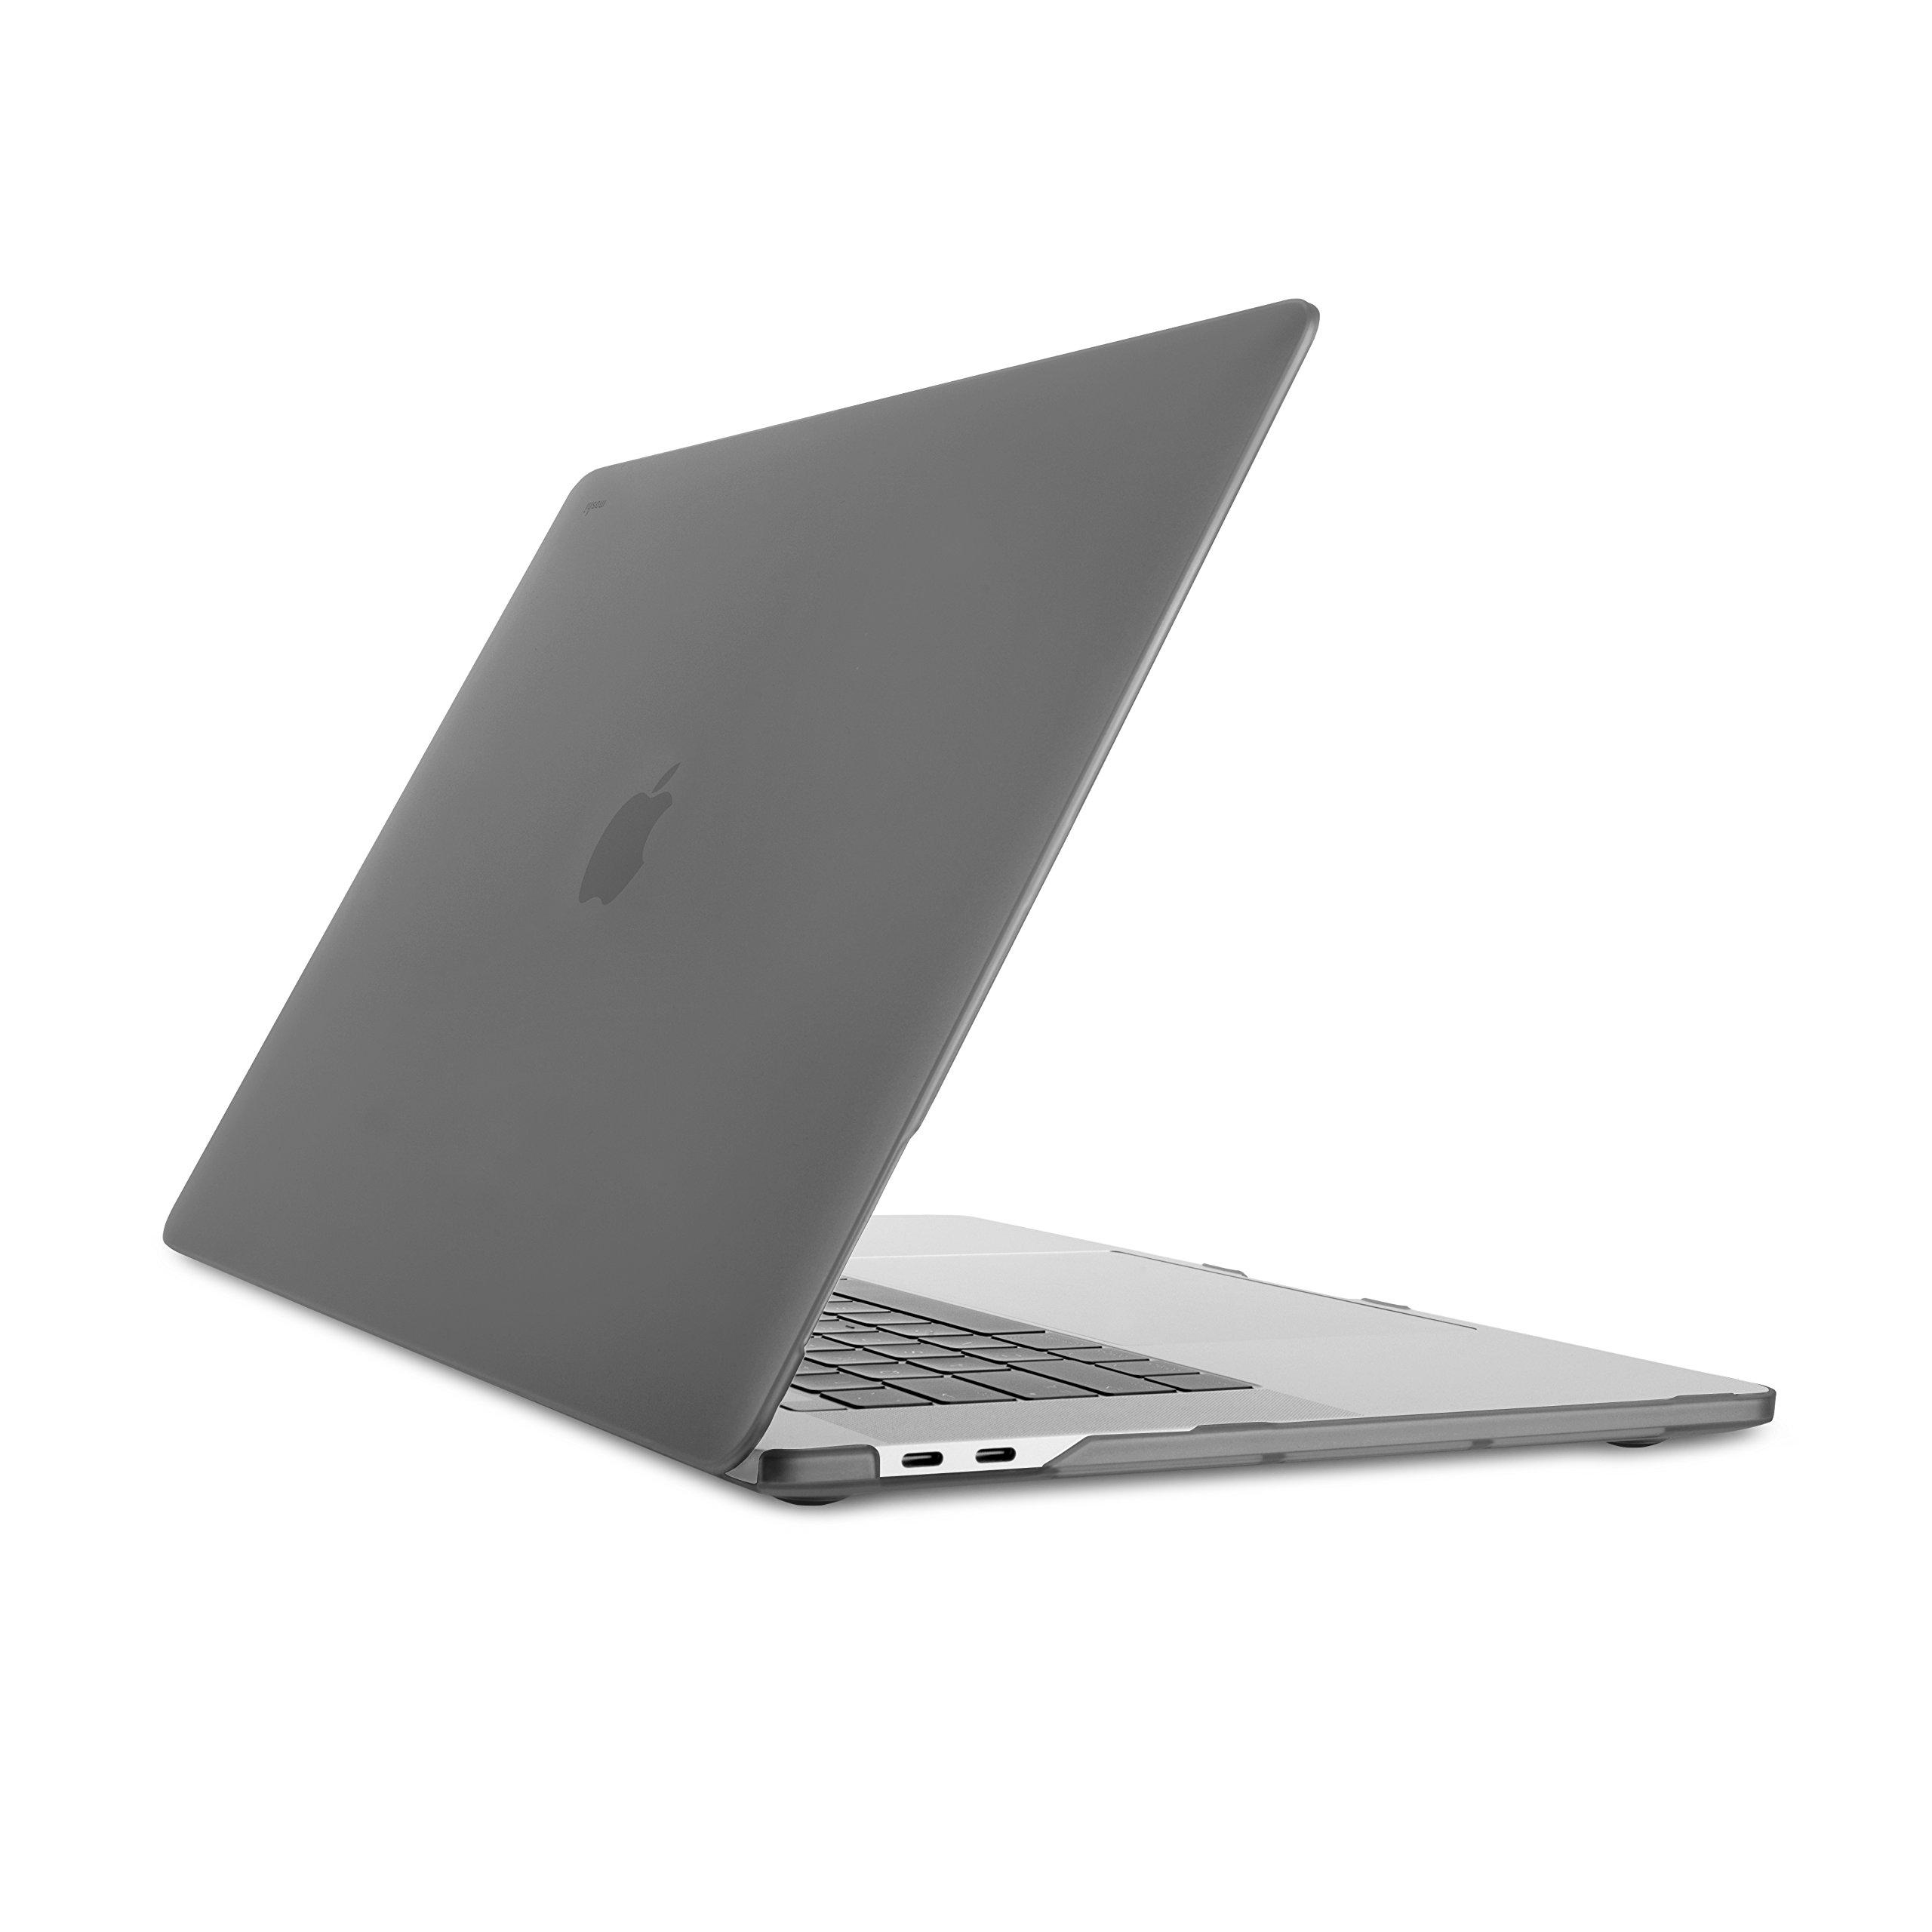 Moshi 99MO071006 iGlaze Hard Case for 2018 New MacBook Pro Retina 15'' & Thunderbolt 3 with Touch Bar, Stealth Black by Moshi (Image #1)